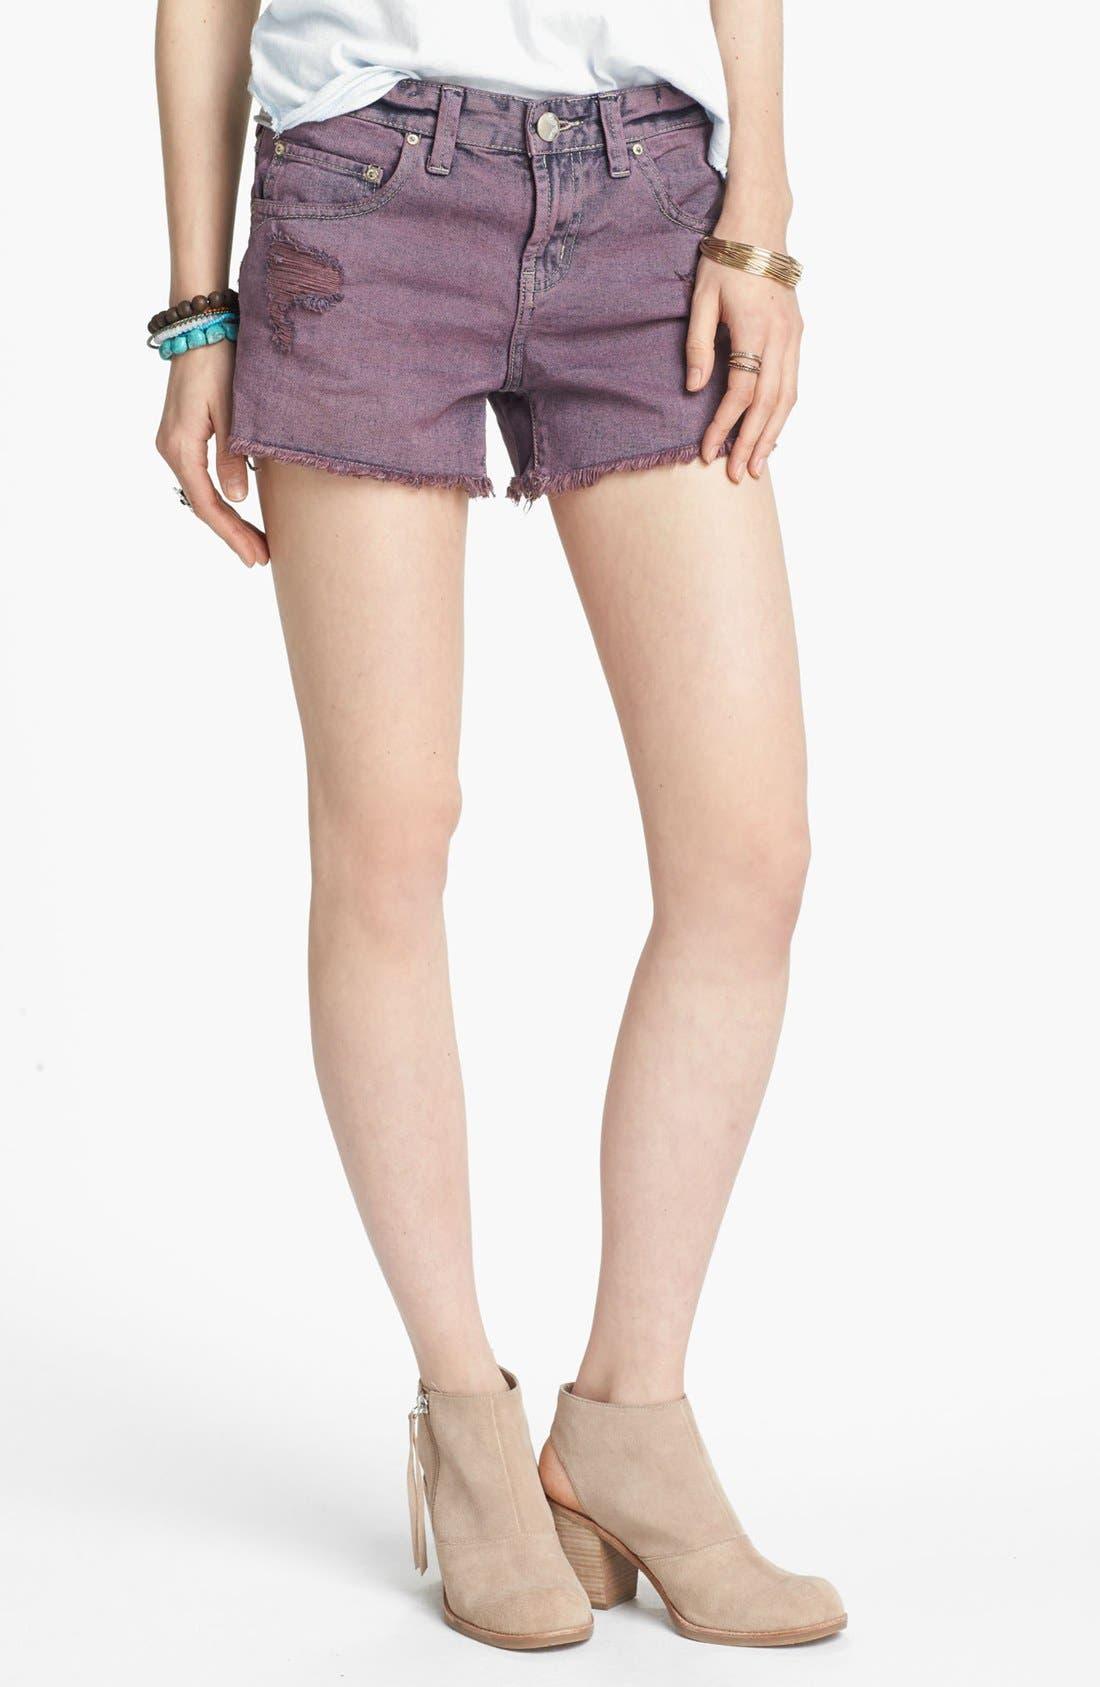 Alternate Image 1 Selected - Free People Overdyed Cutoff Denim Shorts (Lavender Haze)